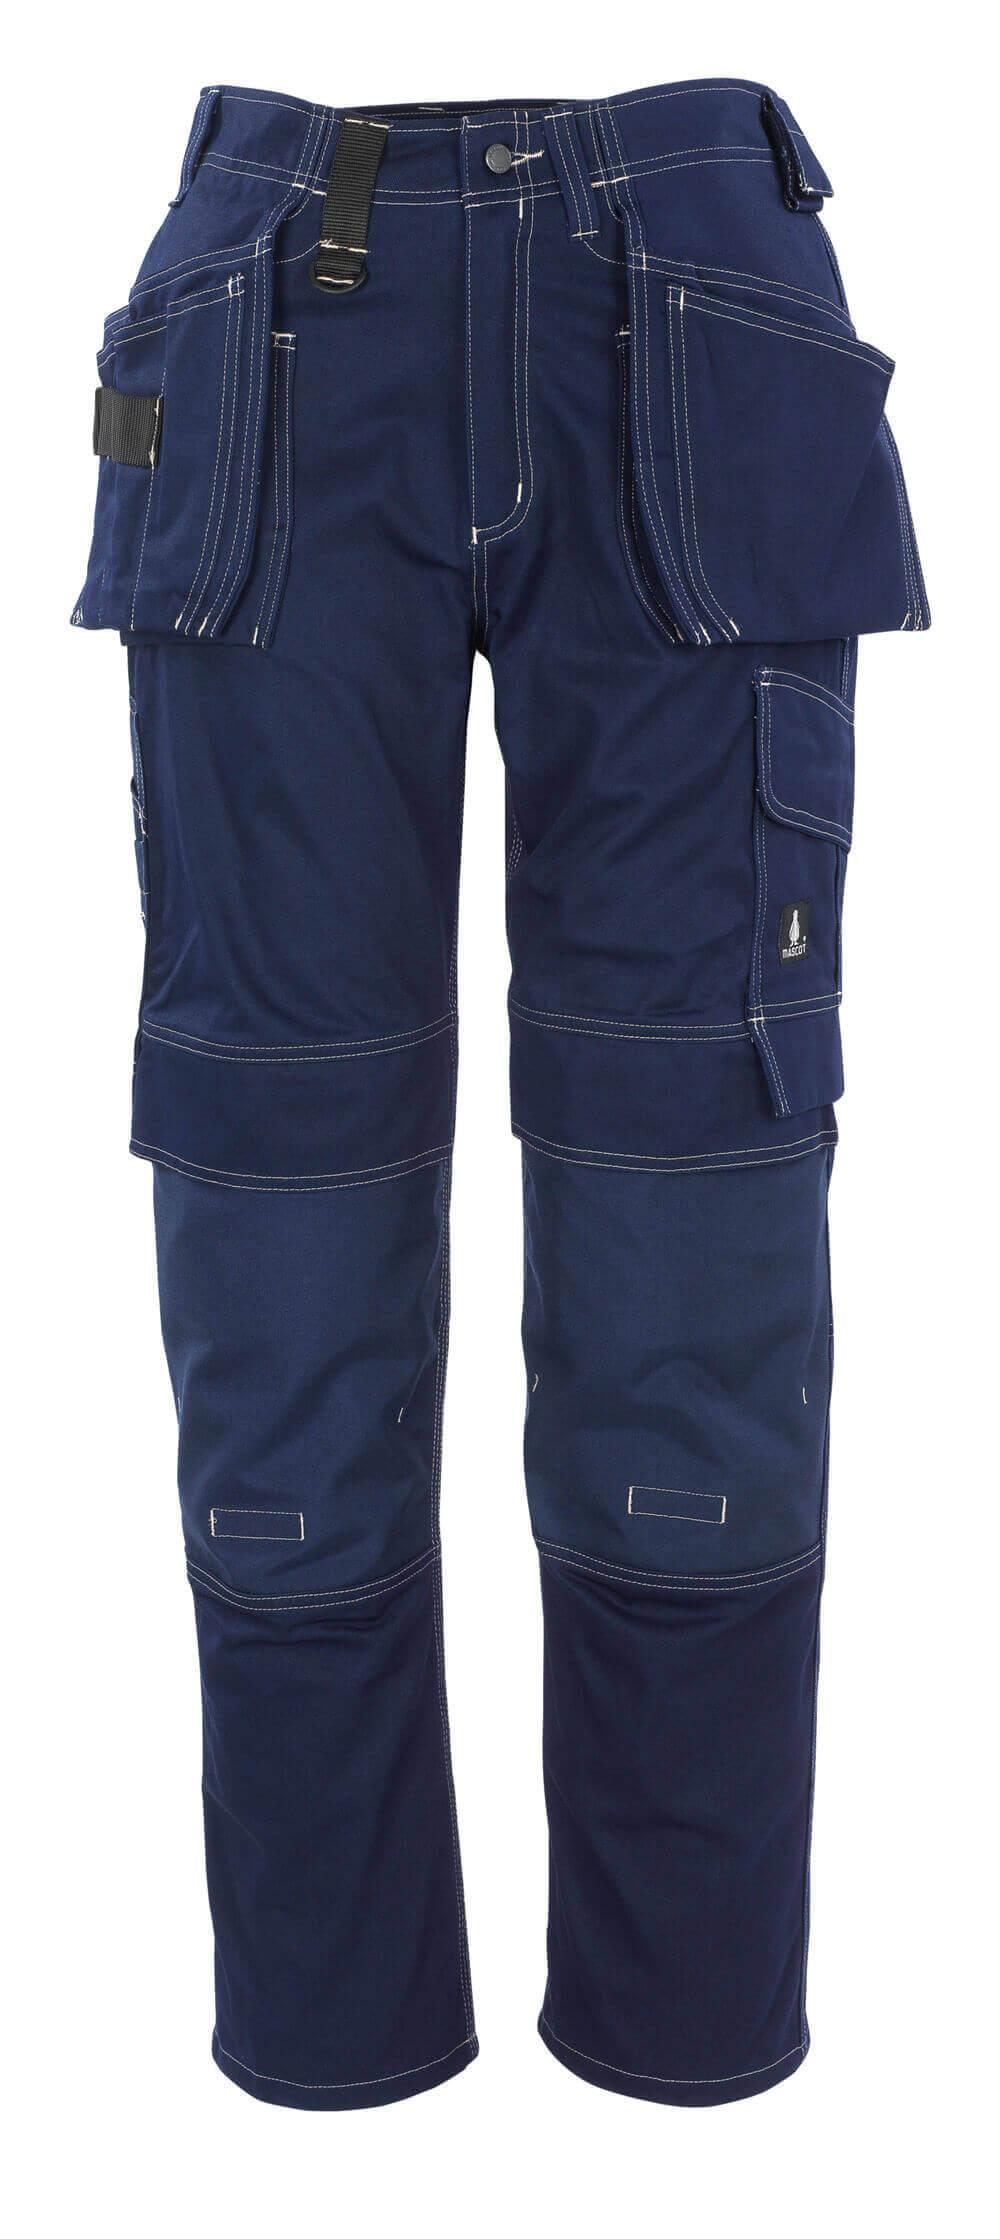 06131-630-01 Pantaloni con tasche esterne - blu navy